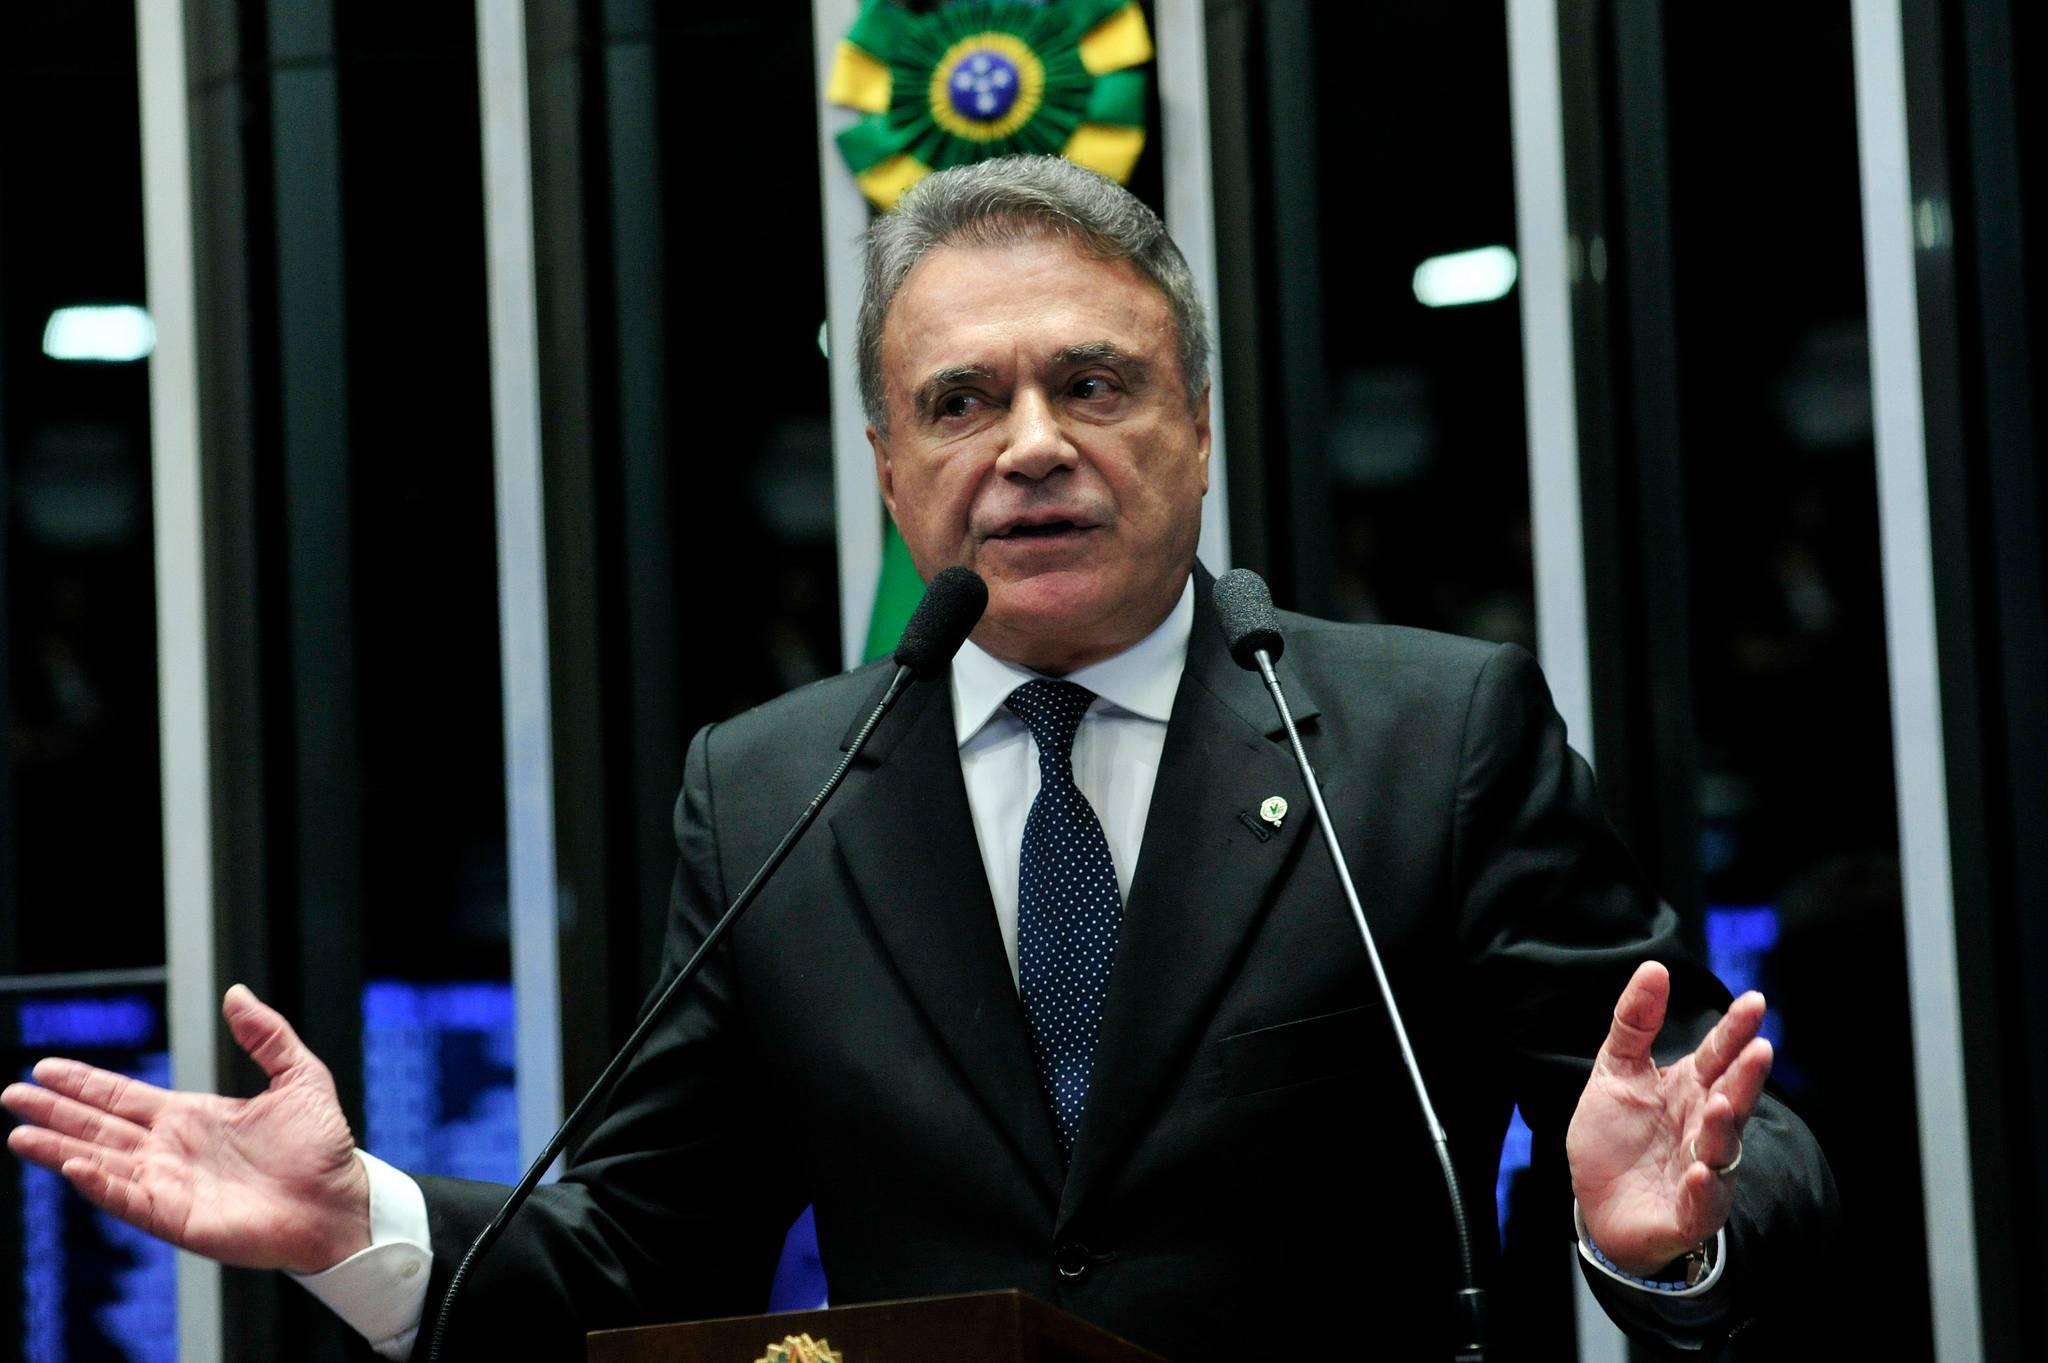 Senador Alvaro Dias (PV-PR). Foto: Geraldo Magela/Agência Senado